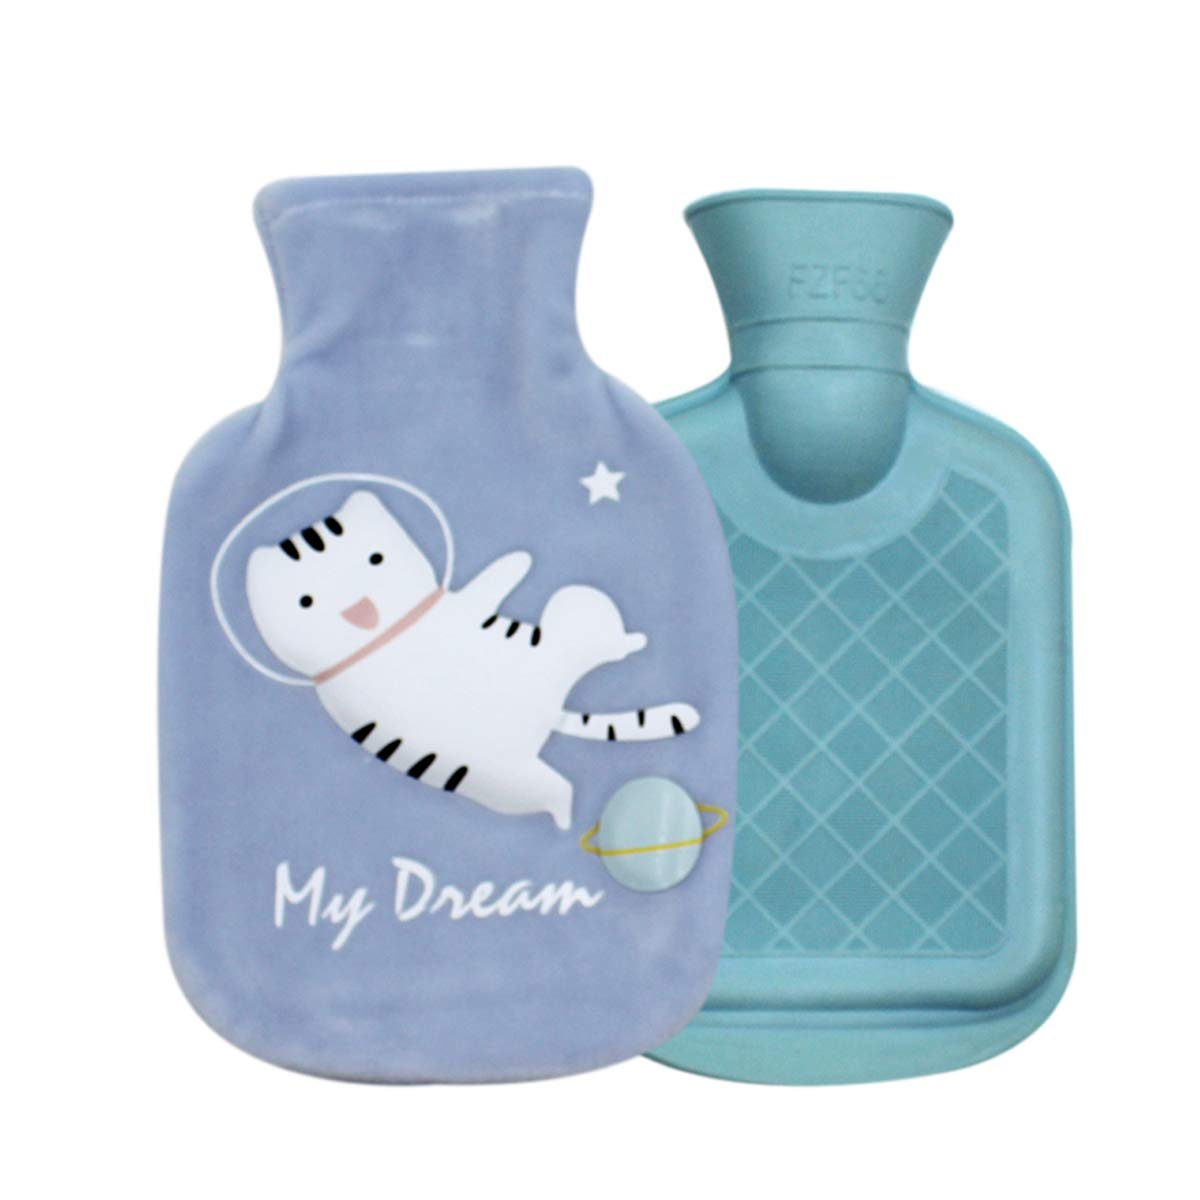 Cute Cat Rubber Hot Water Bottle with Plush Fleece Cover, Hand Feet Belly Warmer